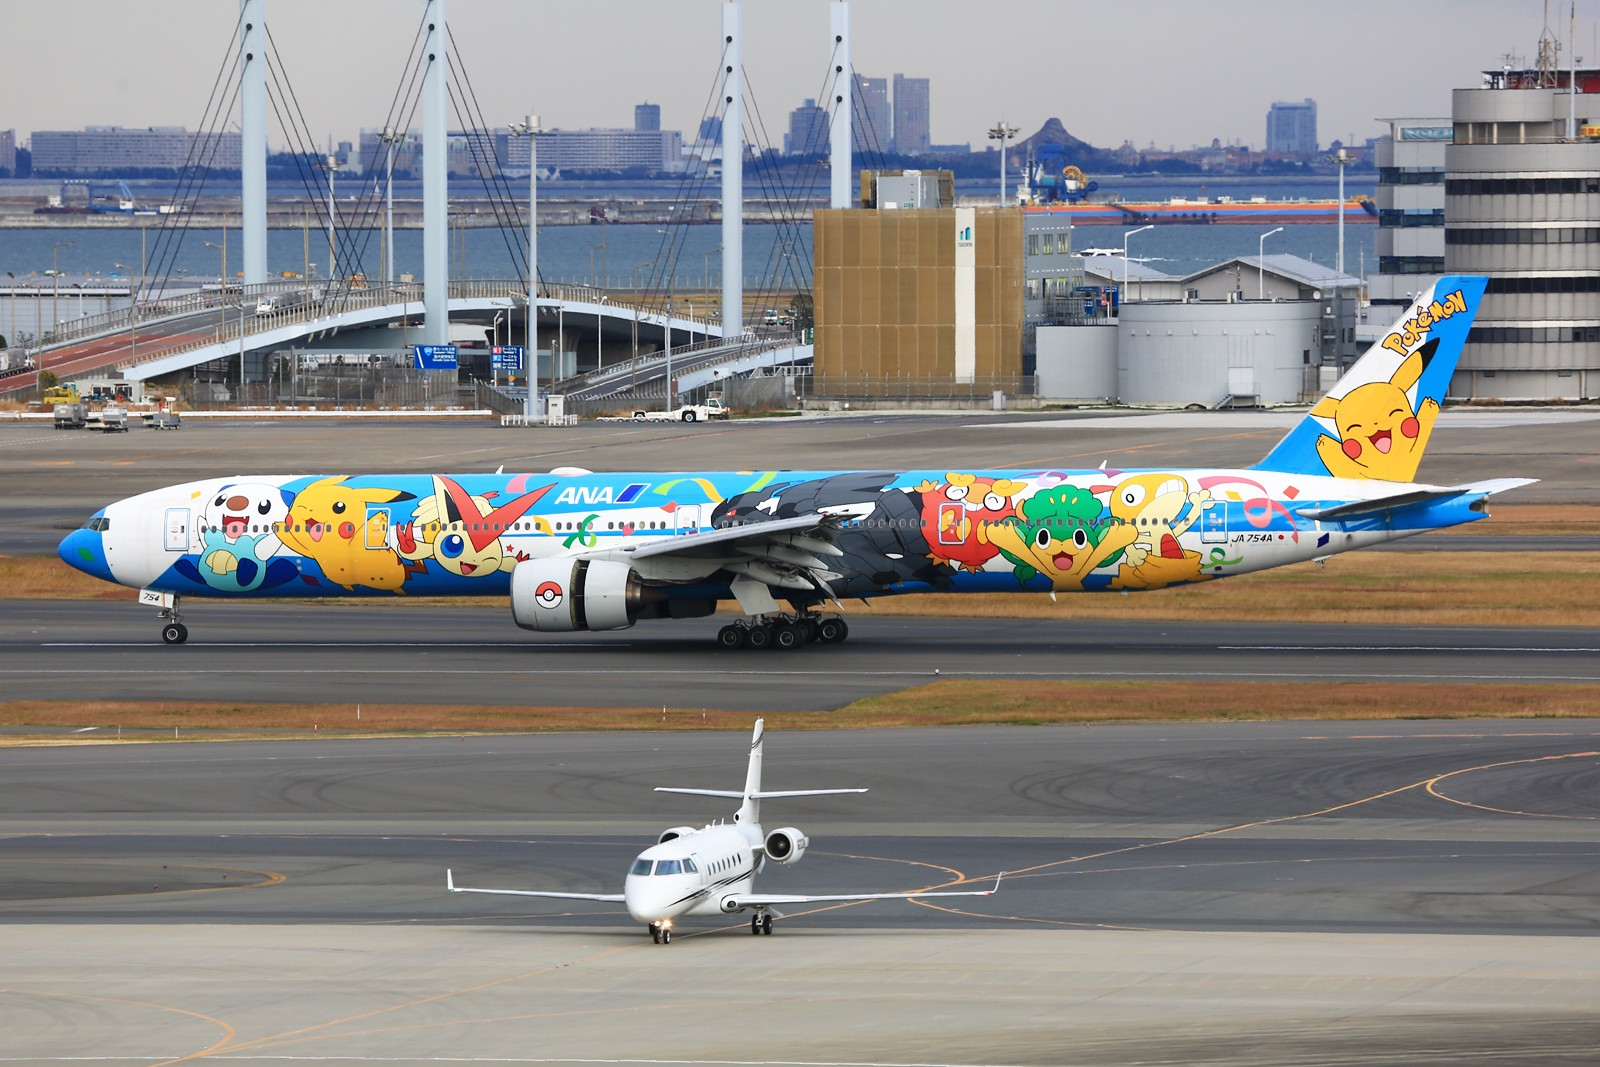 Re:[原创]【HND】******2016新年好,流窜羽田机场:全日空星战,汉莎1500th,以及一些大路货****** BOEING 777-300 JA754A 日本东京羽田国际机场